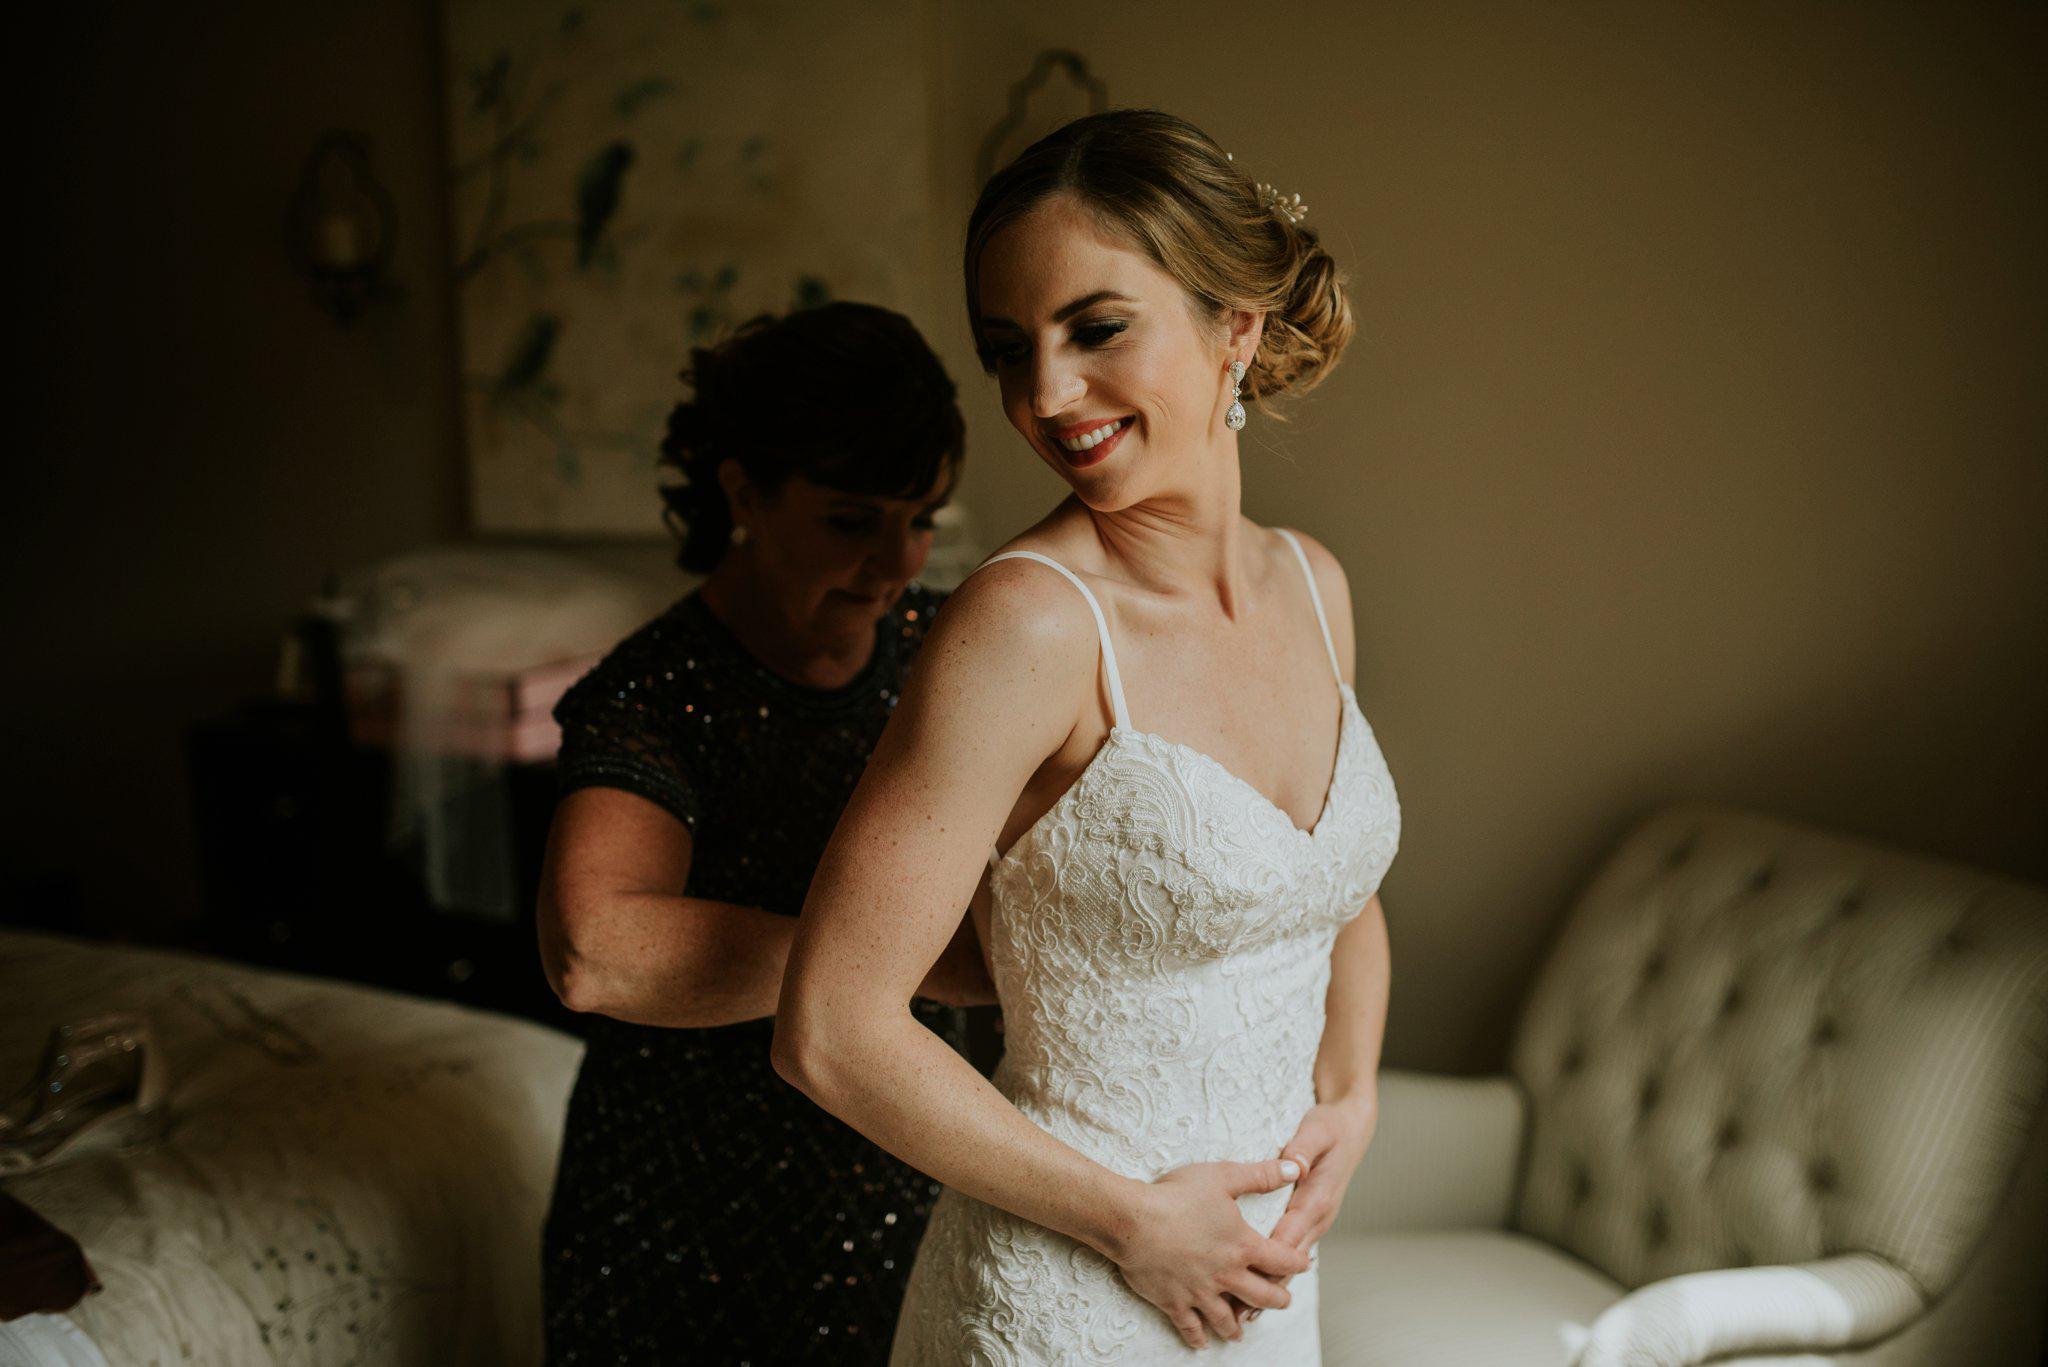 hollywood-school-house-wedding-seattle-photographer-caitlyn-nikula-17.jpg